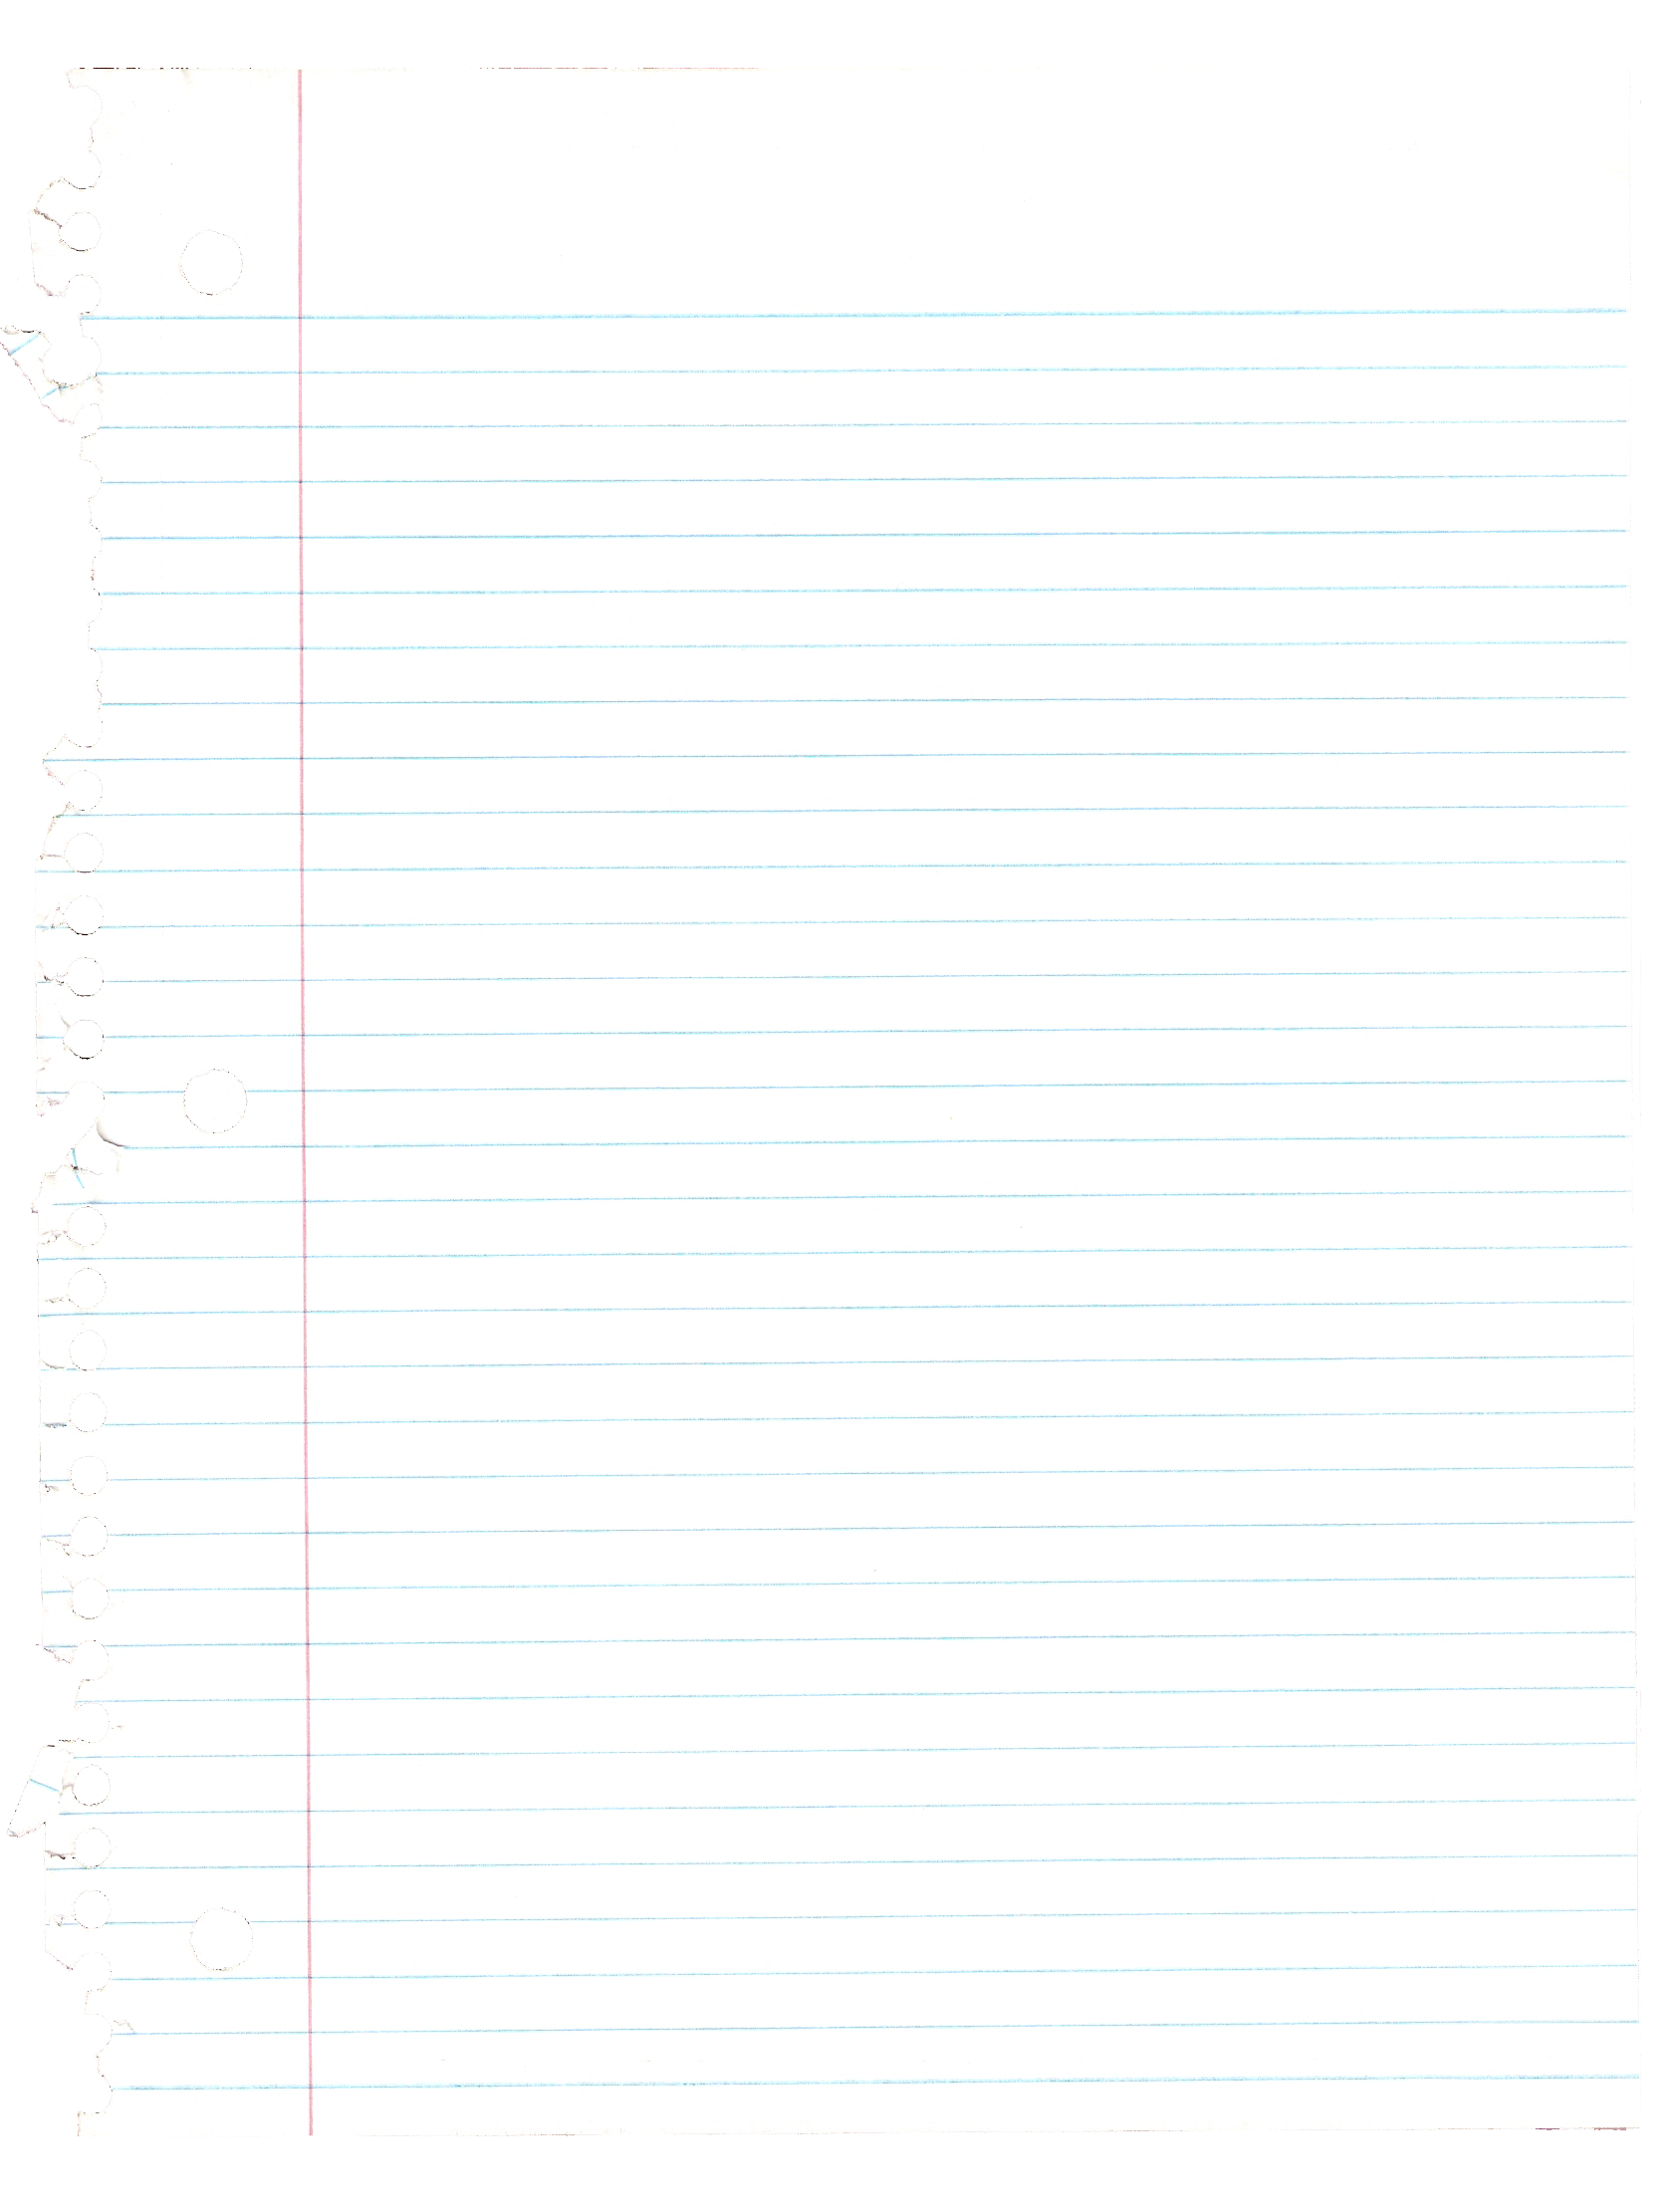 Notebook Paper Wallpaper WallpaperSafari – Notebook Paper